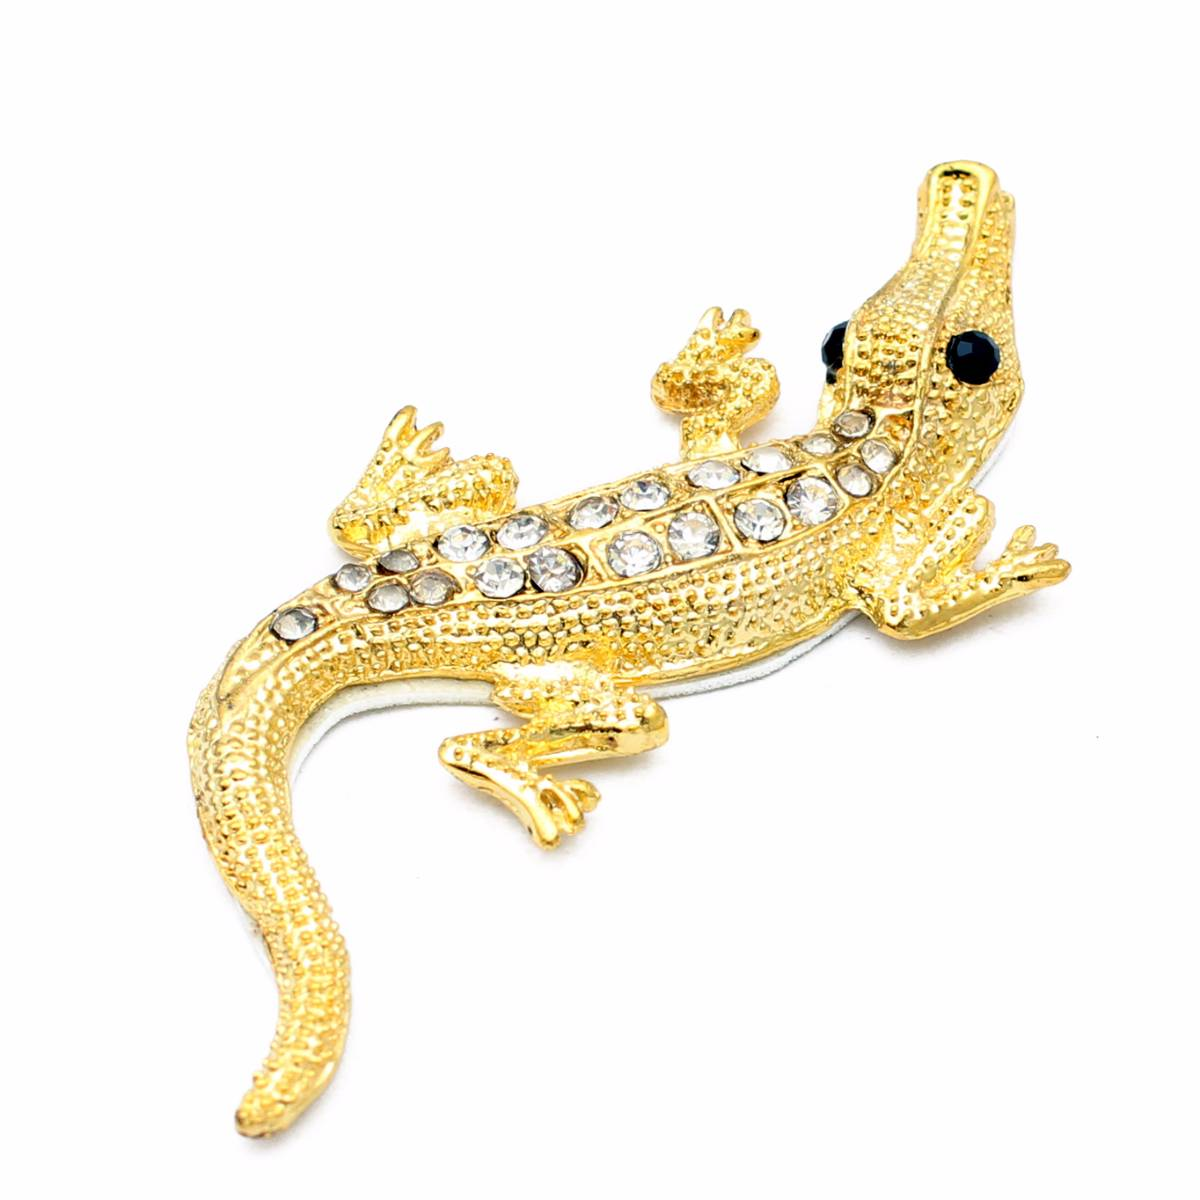 Emblem Variasi Crocodile - Gold